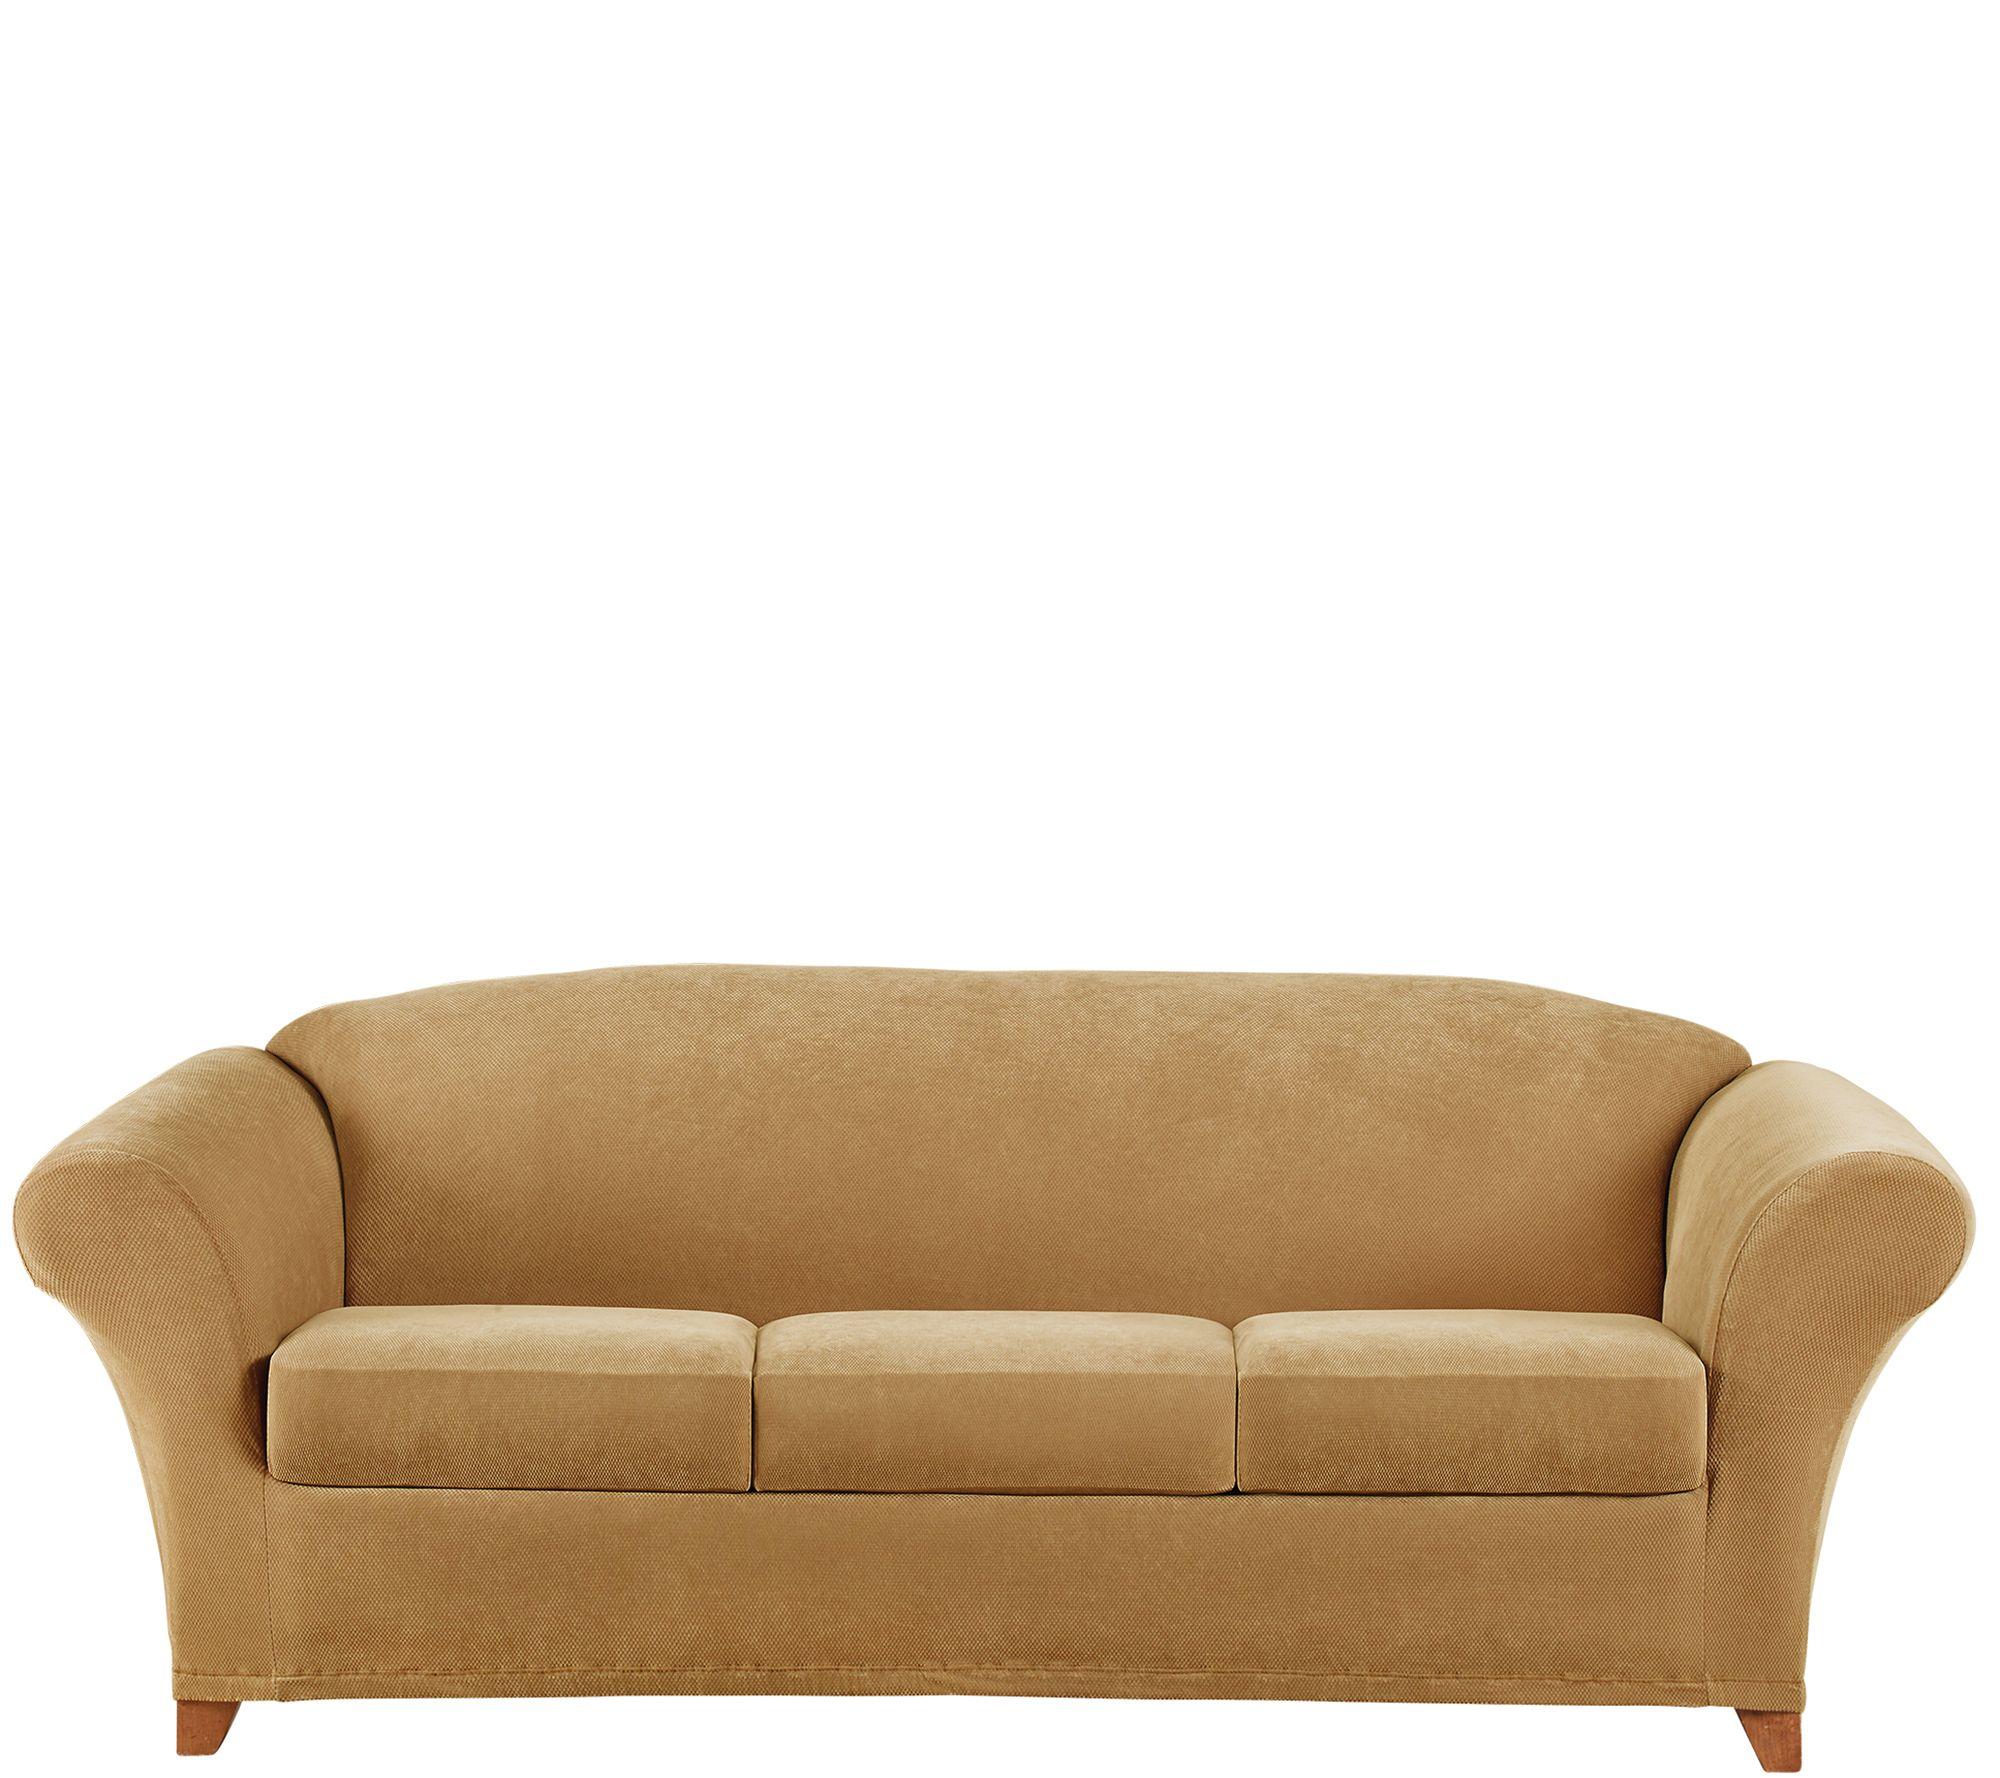 Sure fit stretch pique 3 seat sofa slipcover qvccom for Sure fit stretch sofa cover